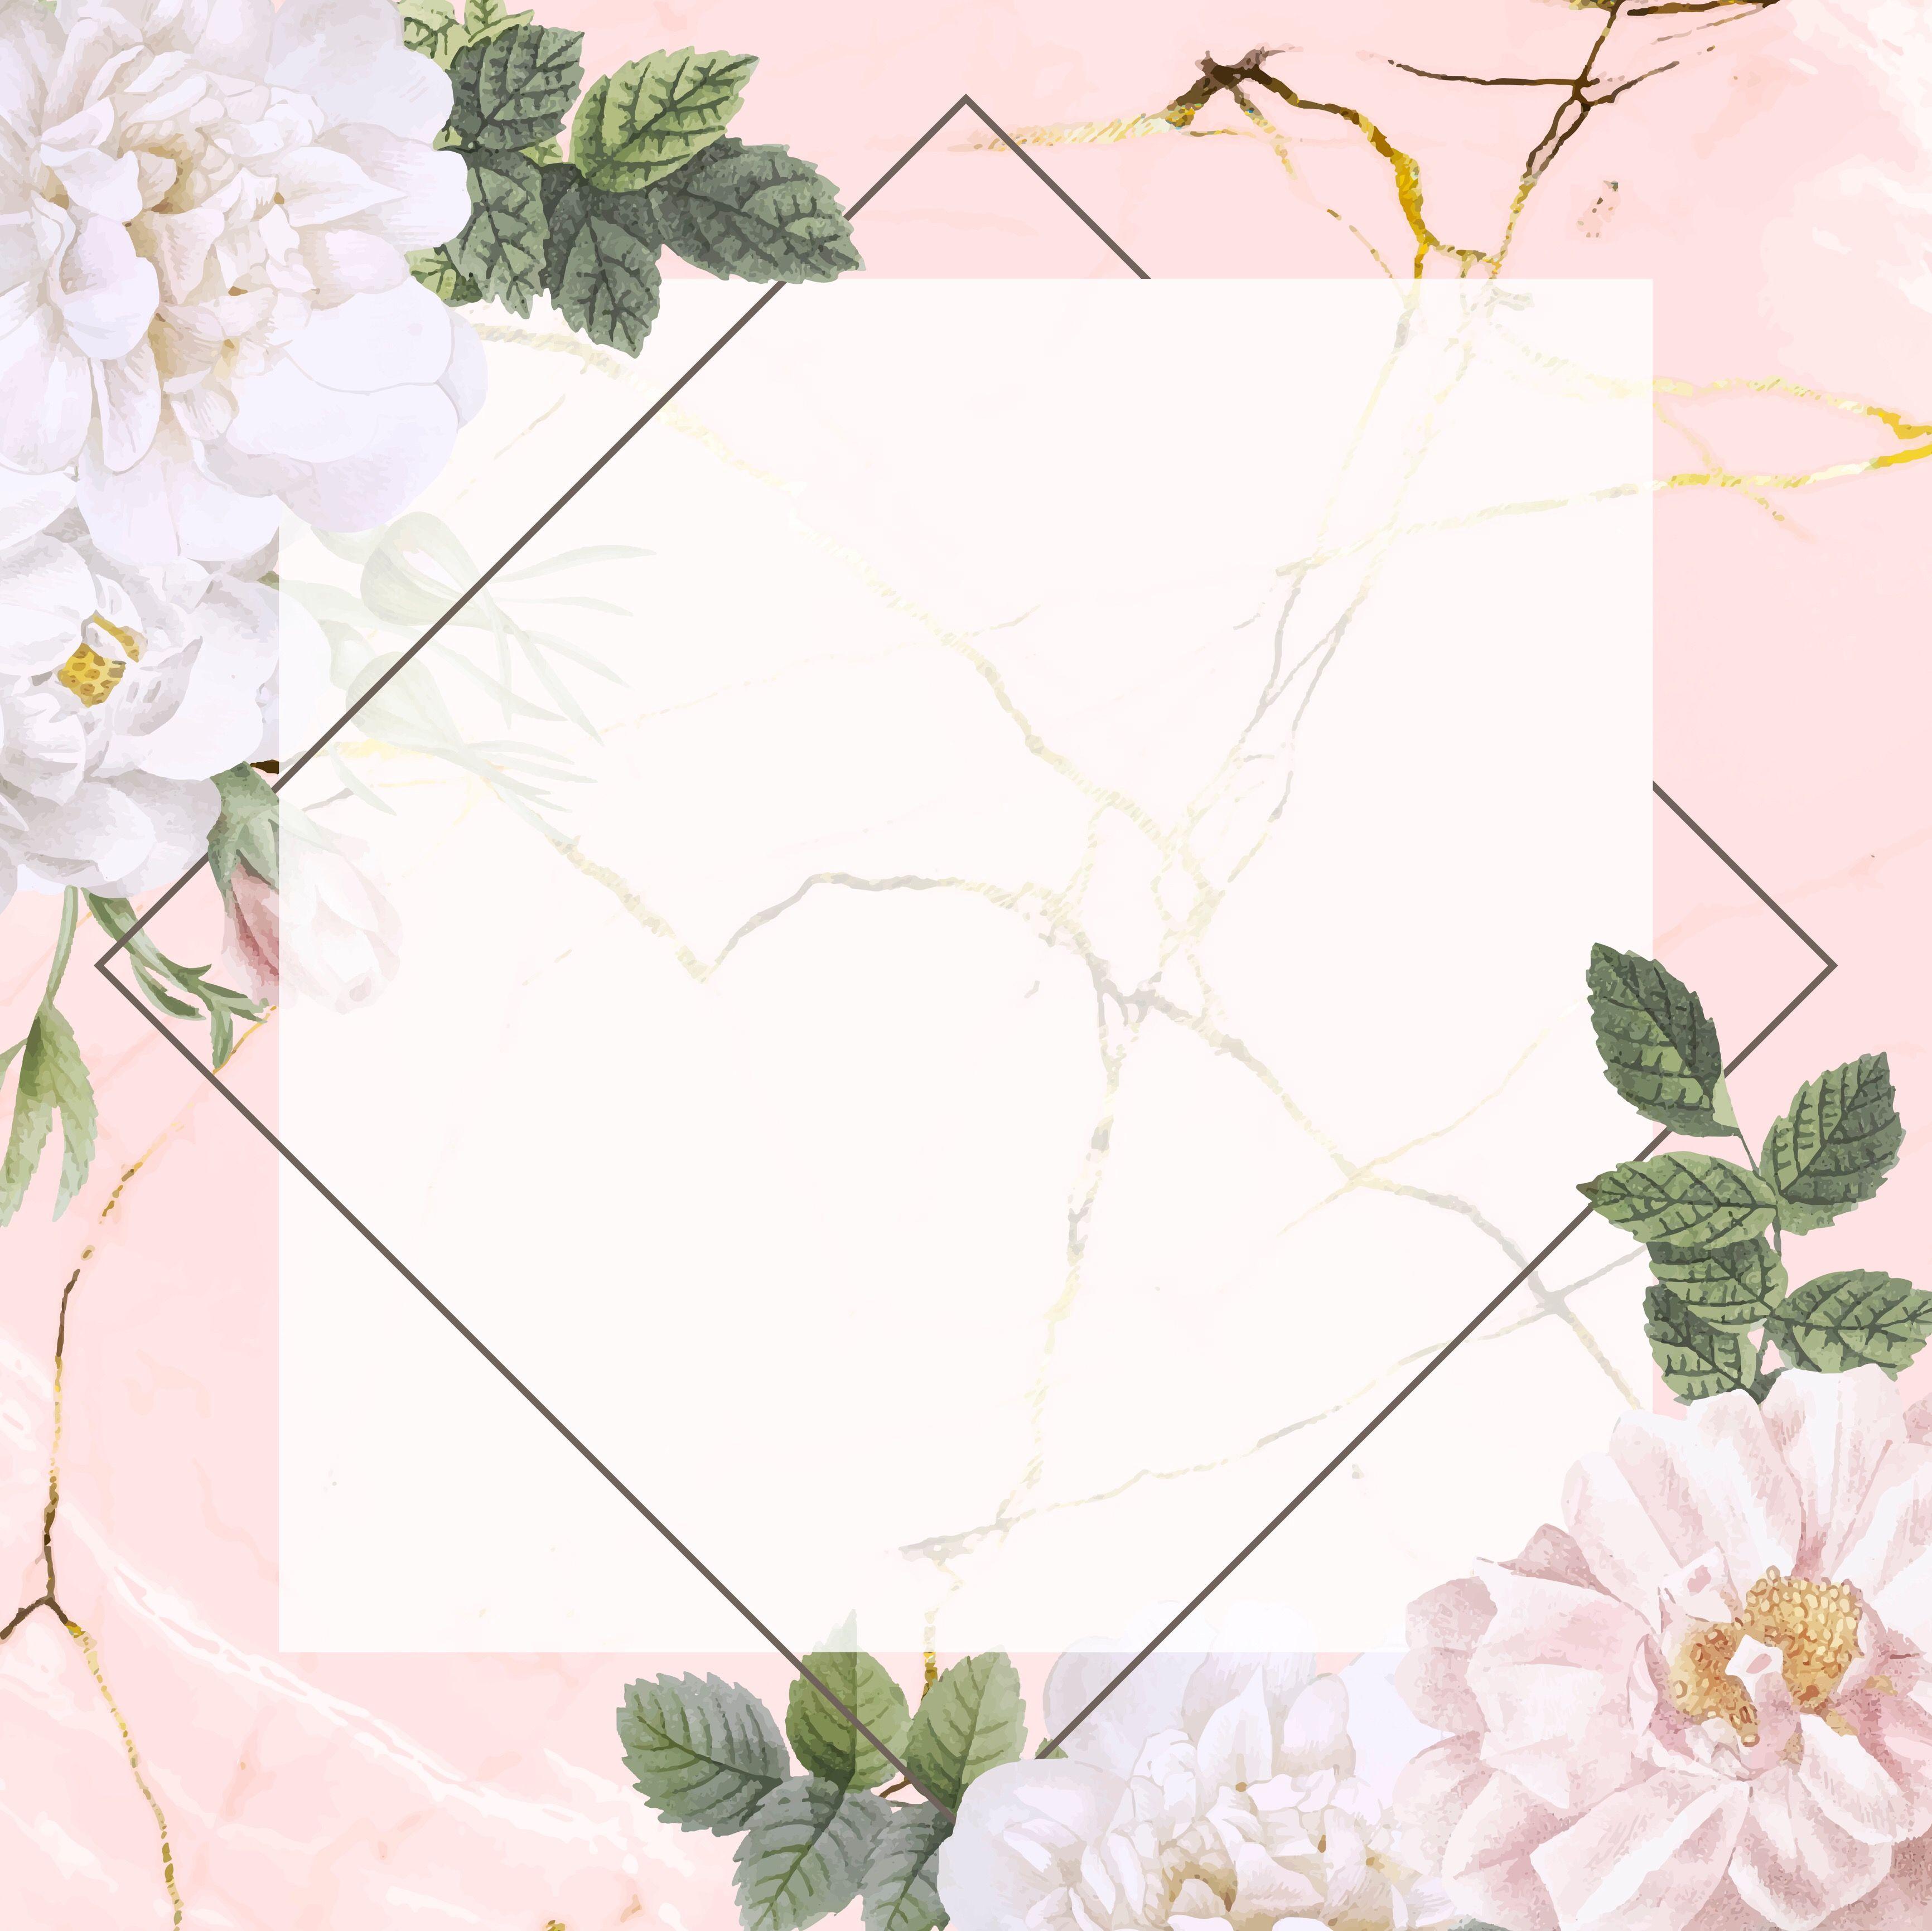 Freetoedit صور ثيمات بنت برواز ورق زهرة الاوركيد ابيض Remixit Marble Background Musk Rose Flower Background Wallpaper